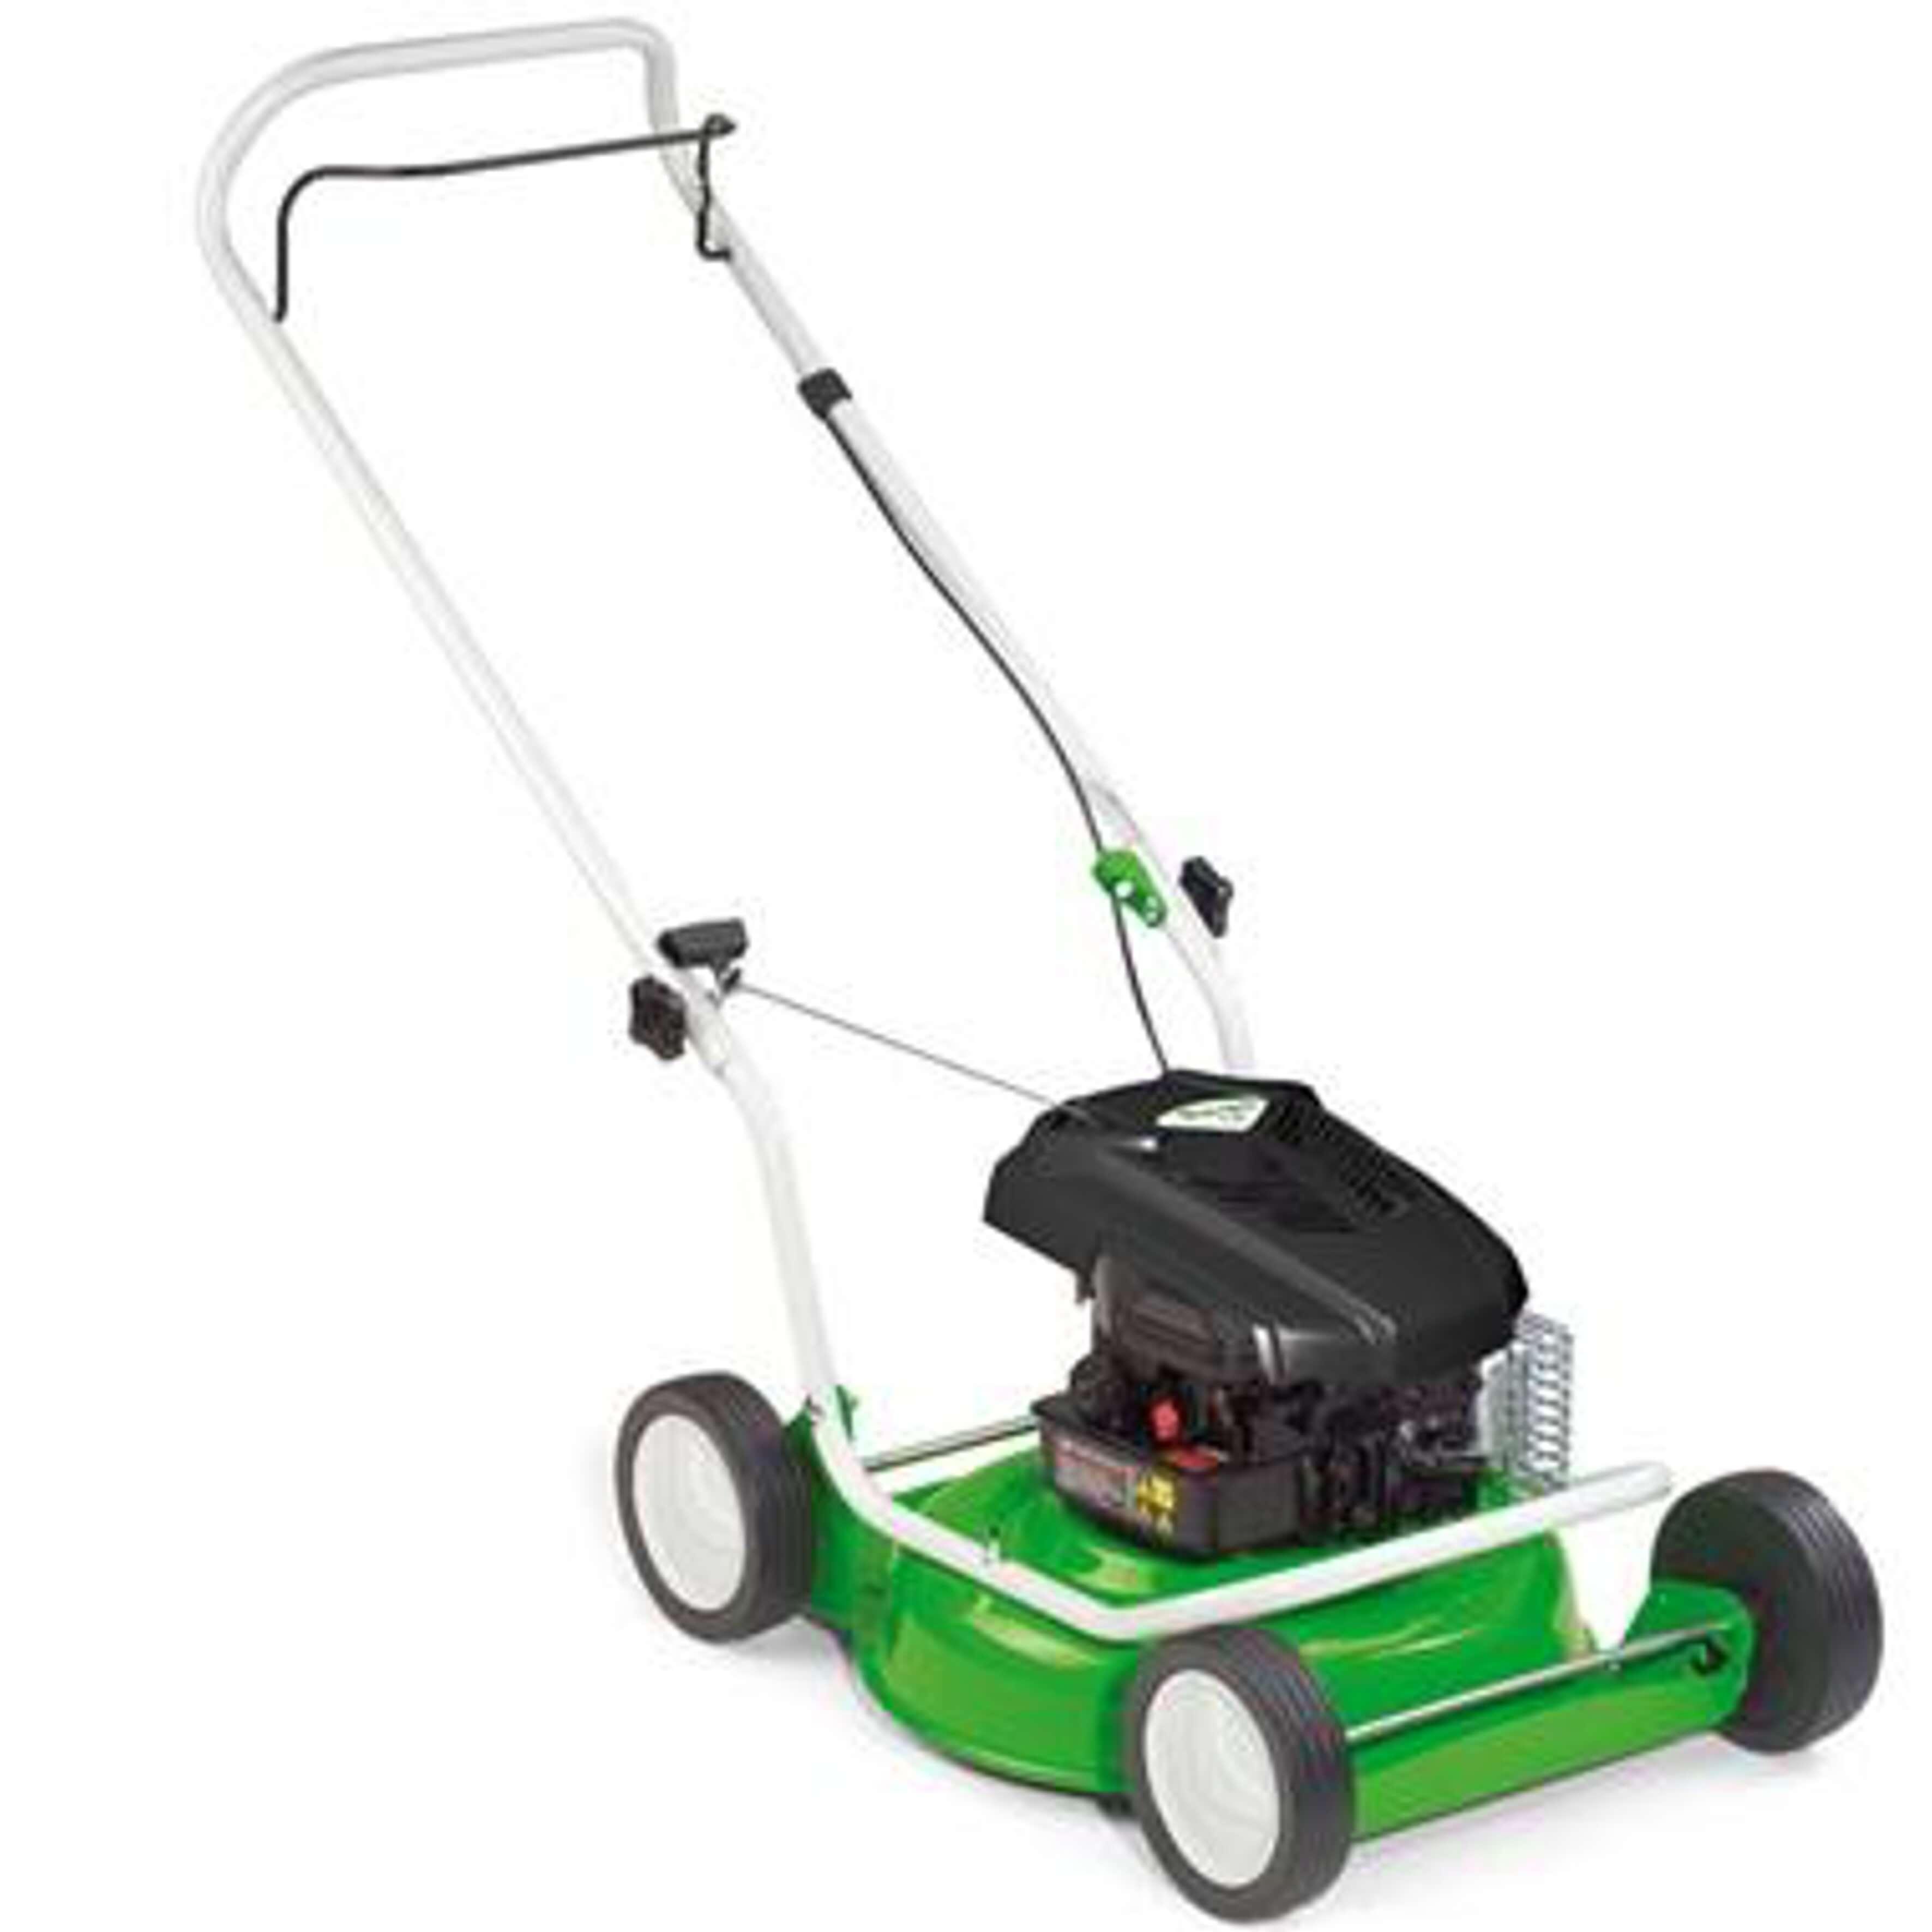 Viking MB 2 R Petrol Lawn Mowers